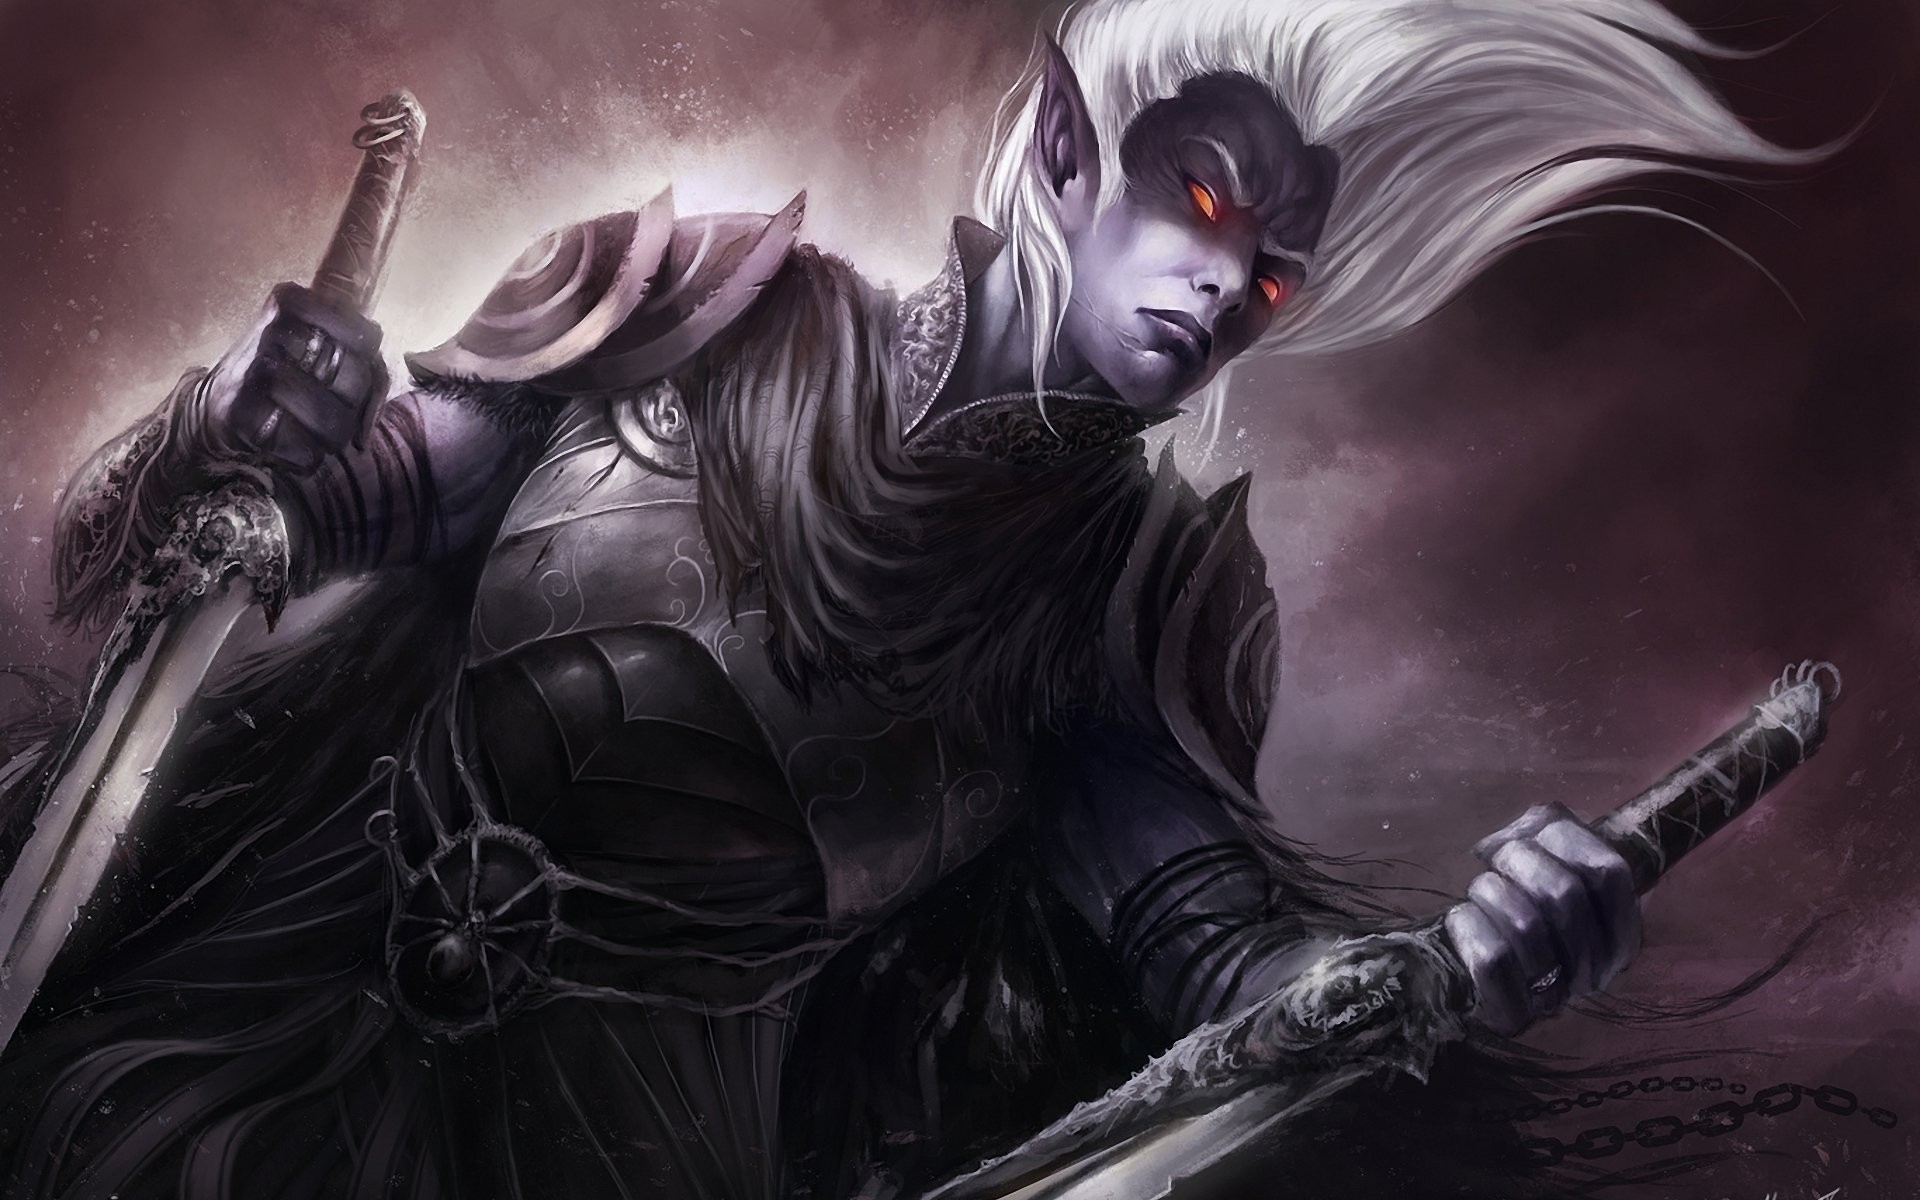 art dark elf drow drizzt do'urden burning eyes armour blade chains